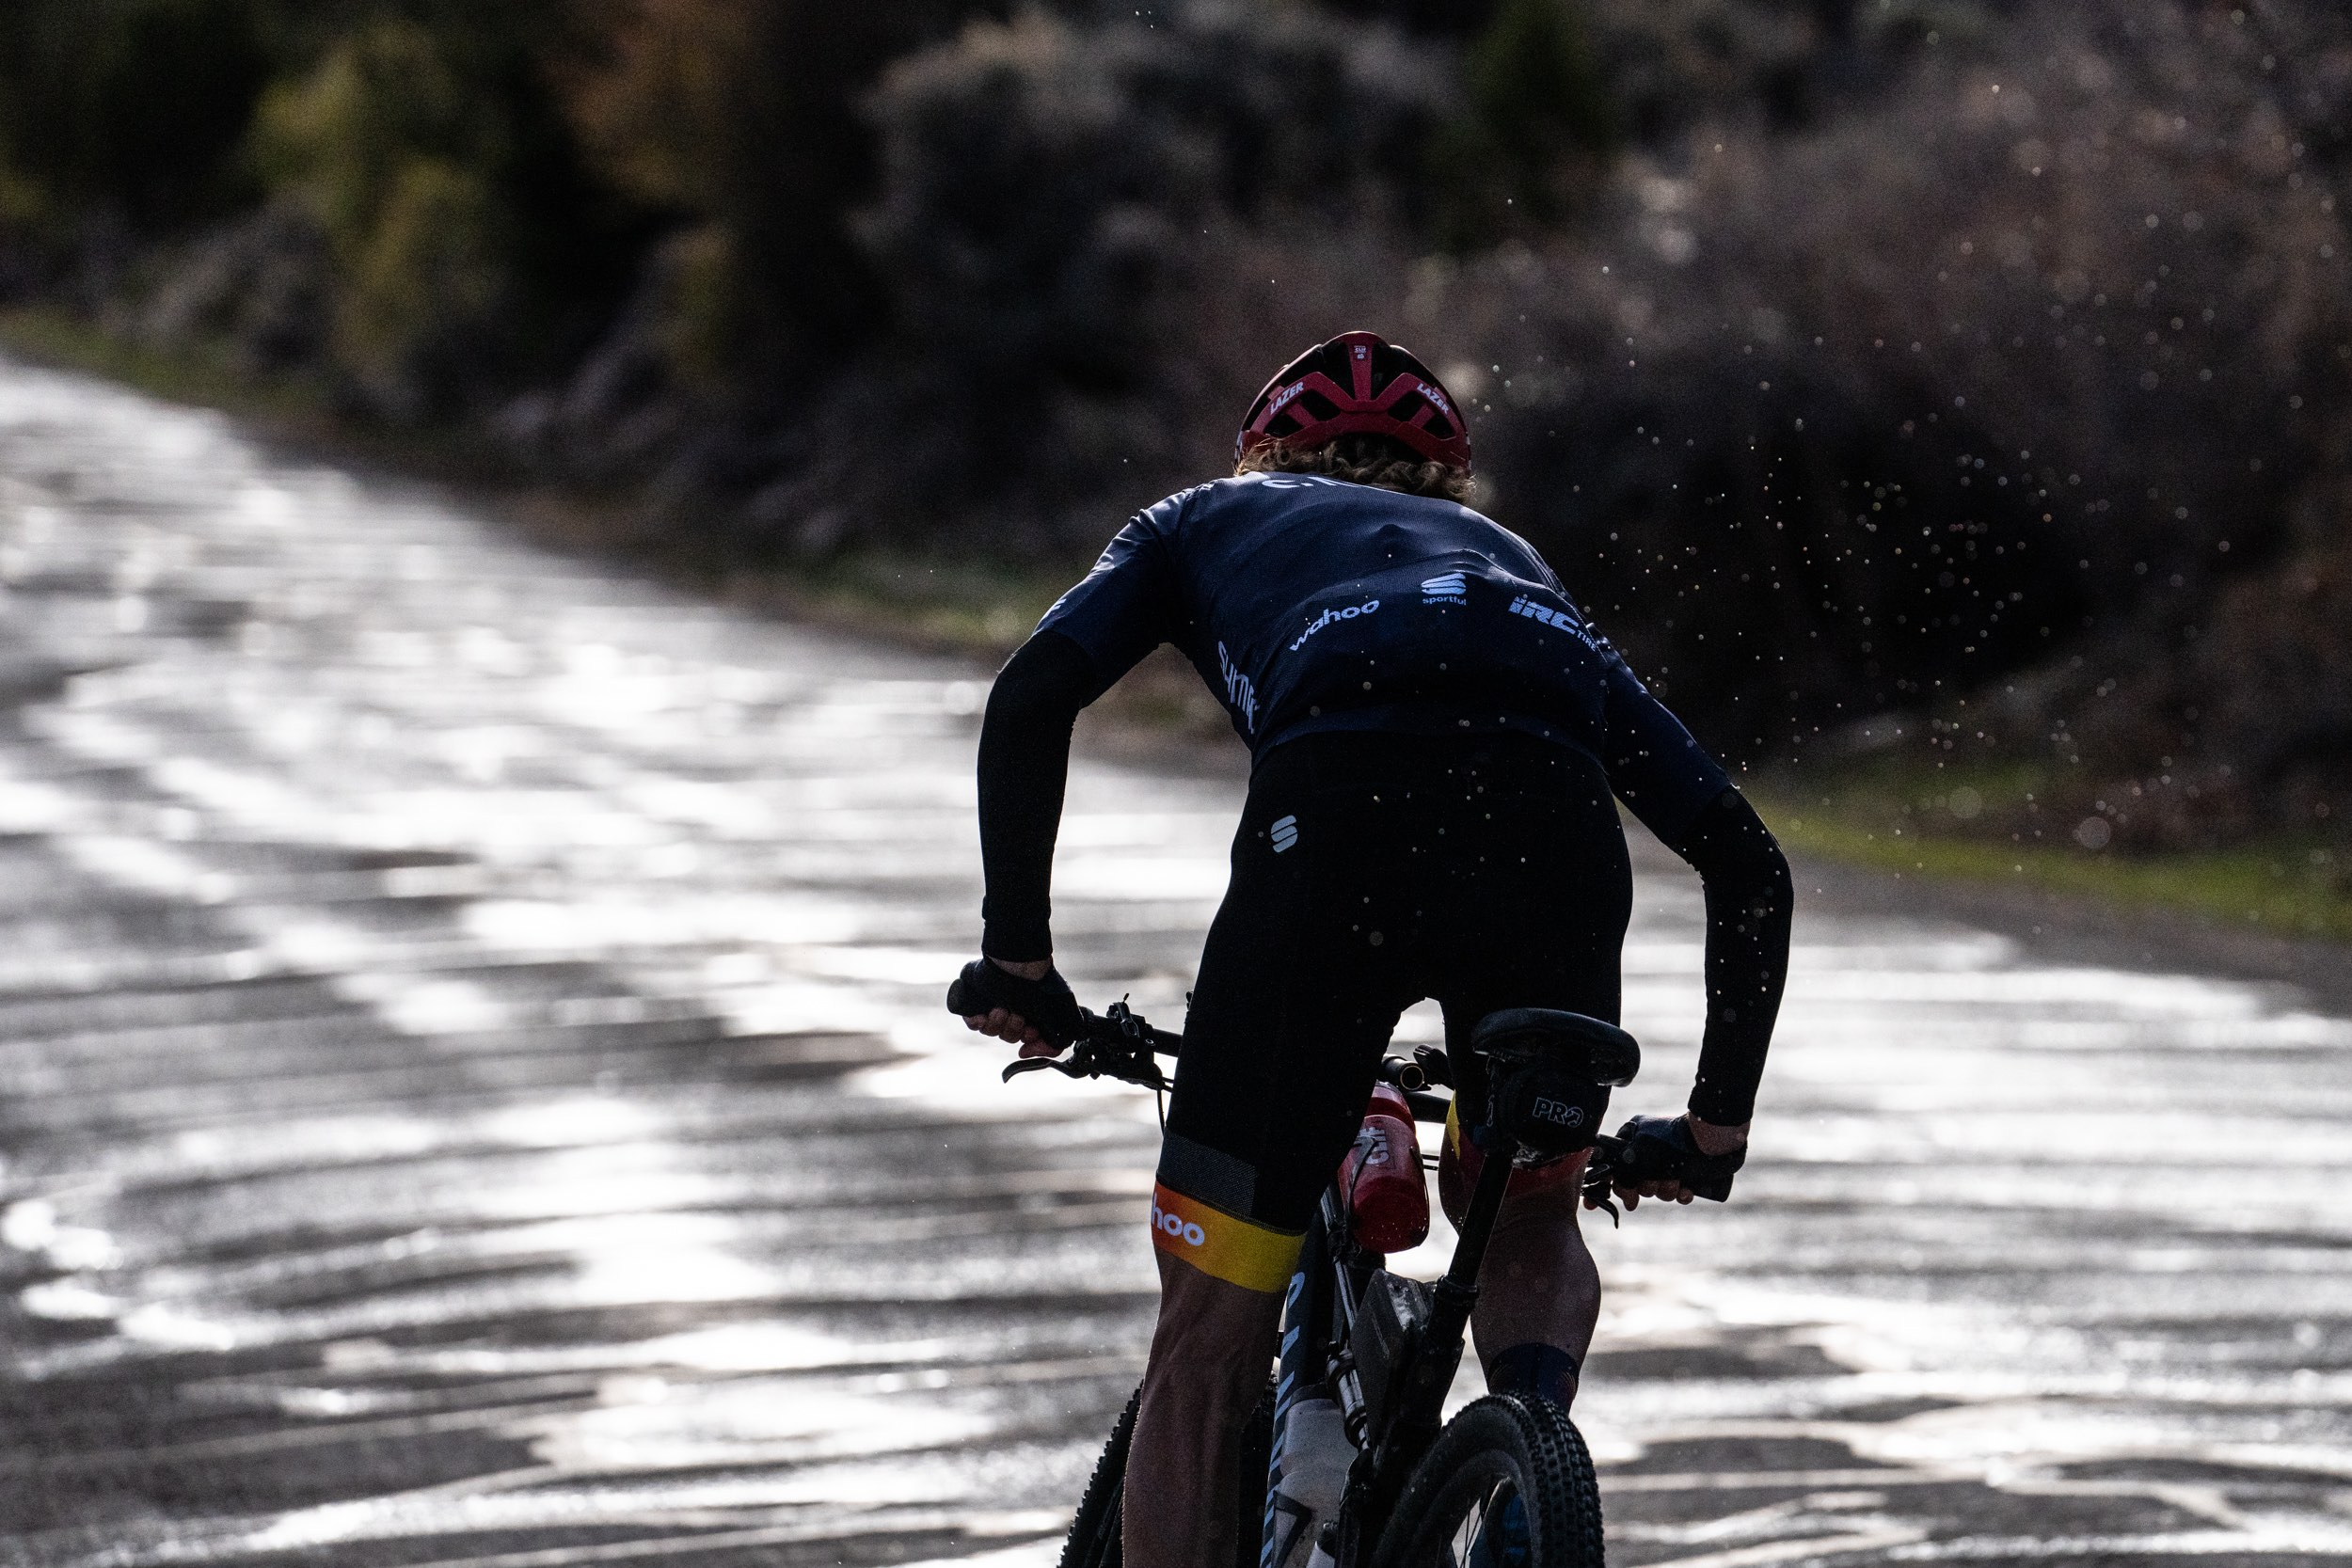 Stetina rides away